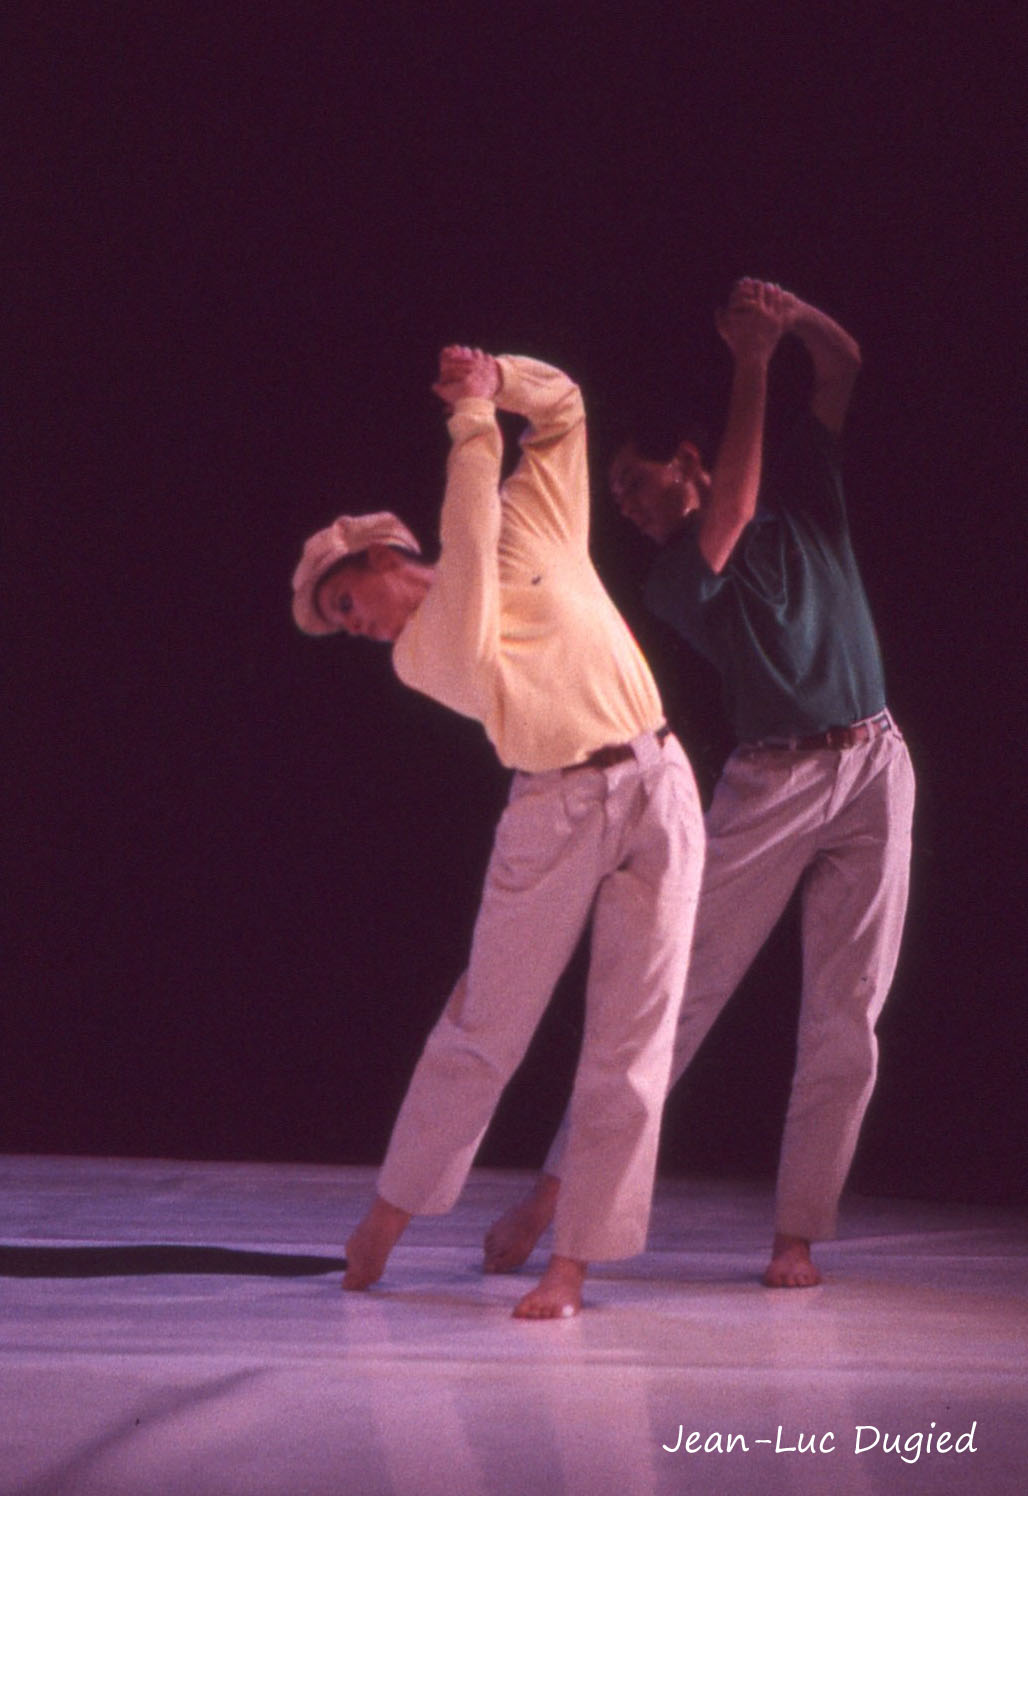 27 Dugied Fabrice - au fond du green l'équilibre - Geneviève Mazin et Bernard Collin - 1988